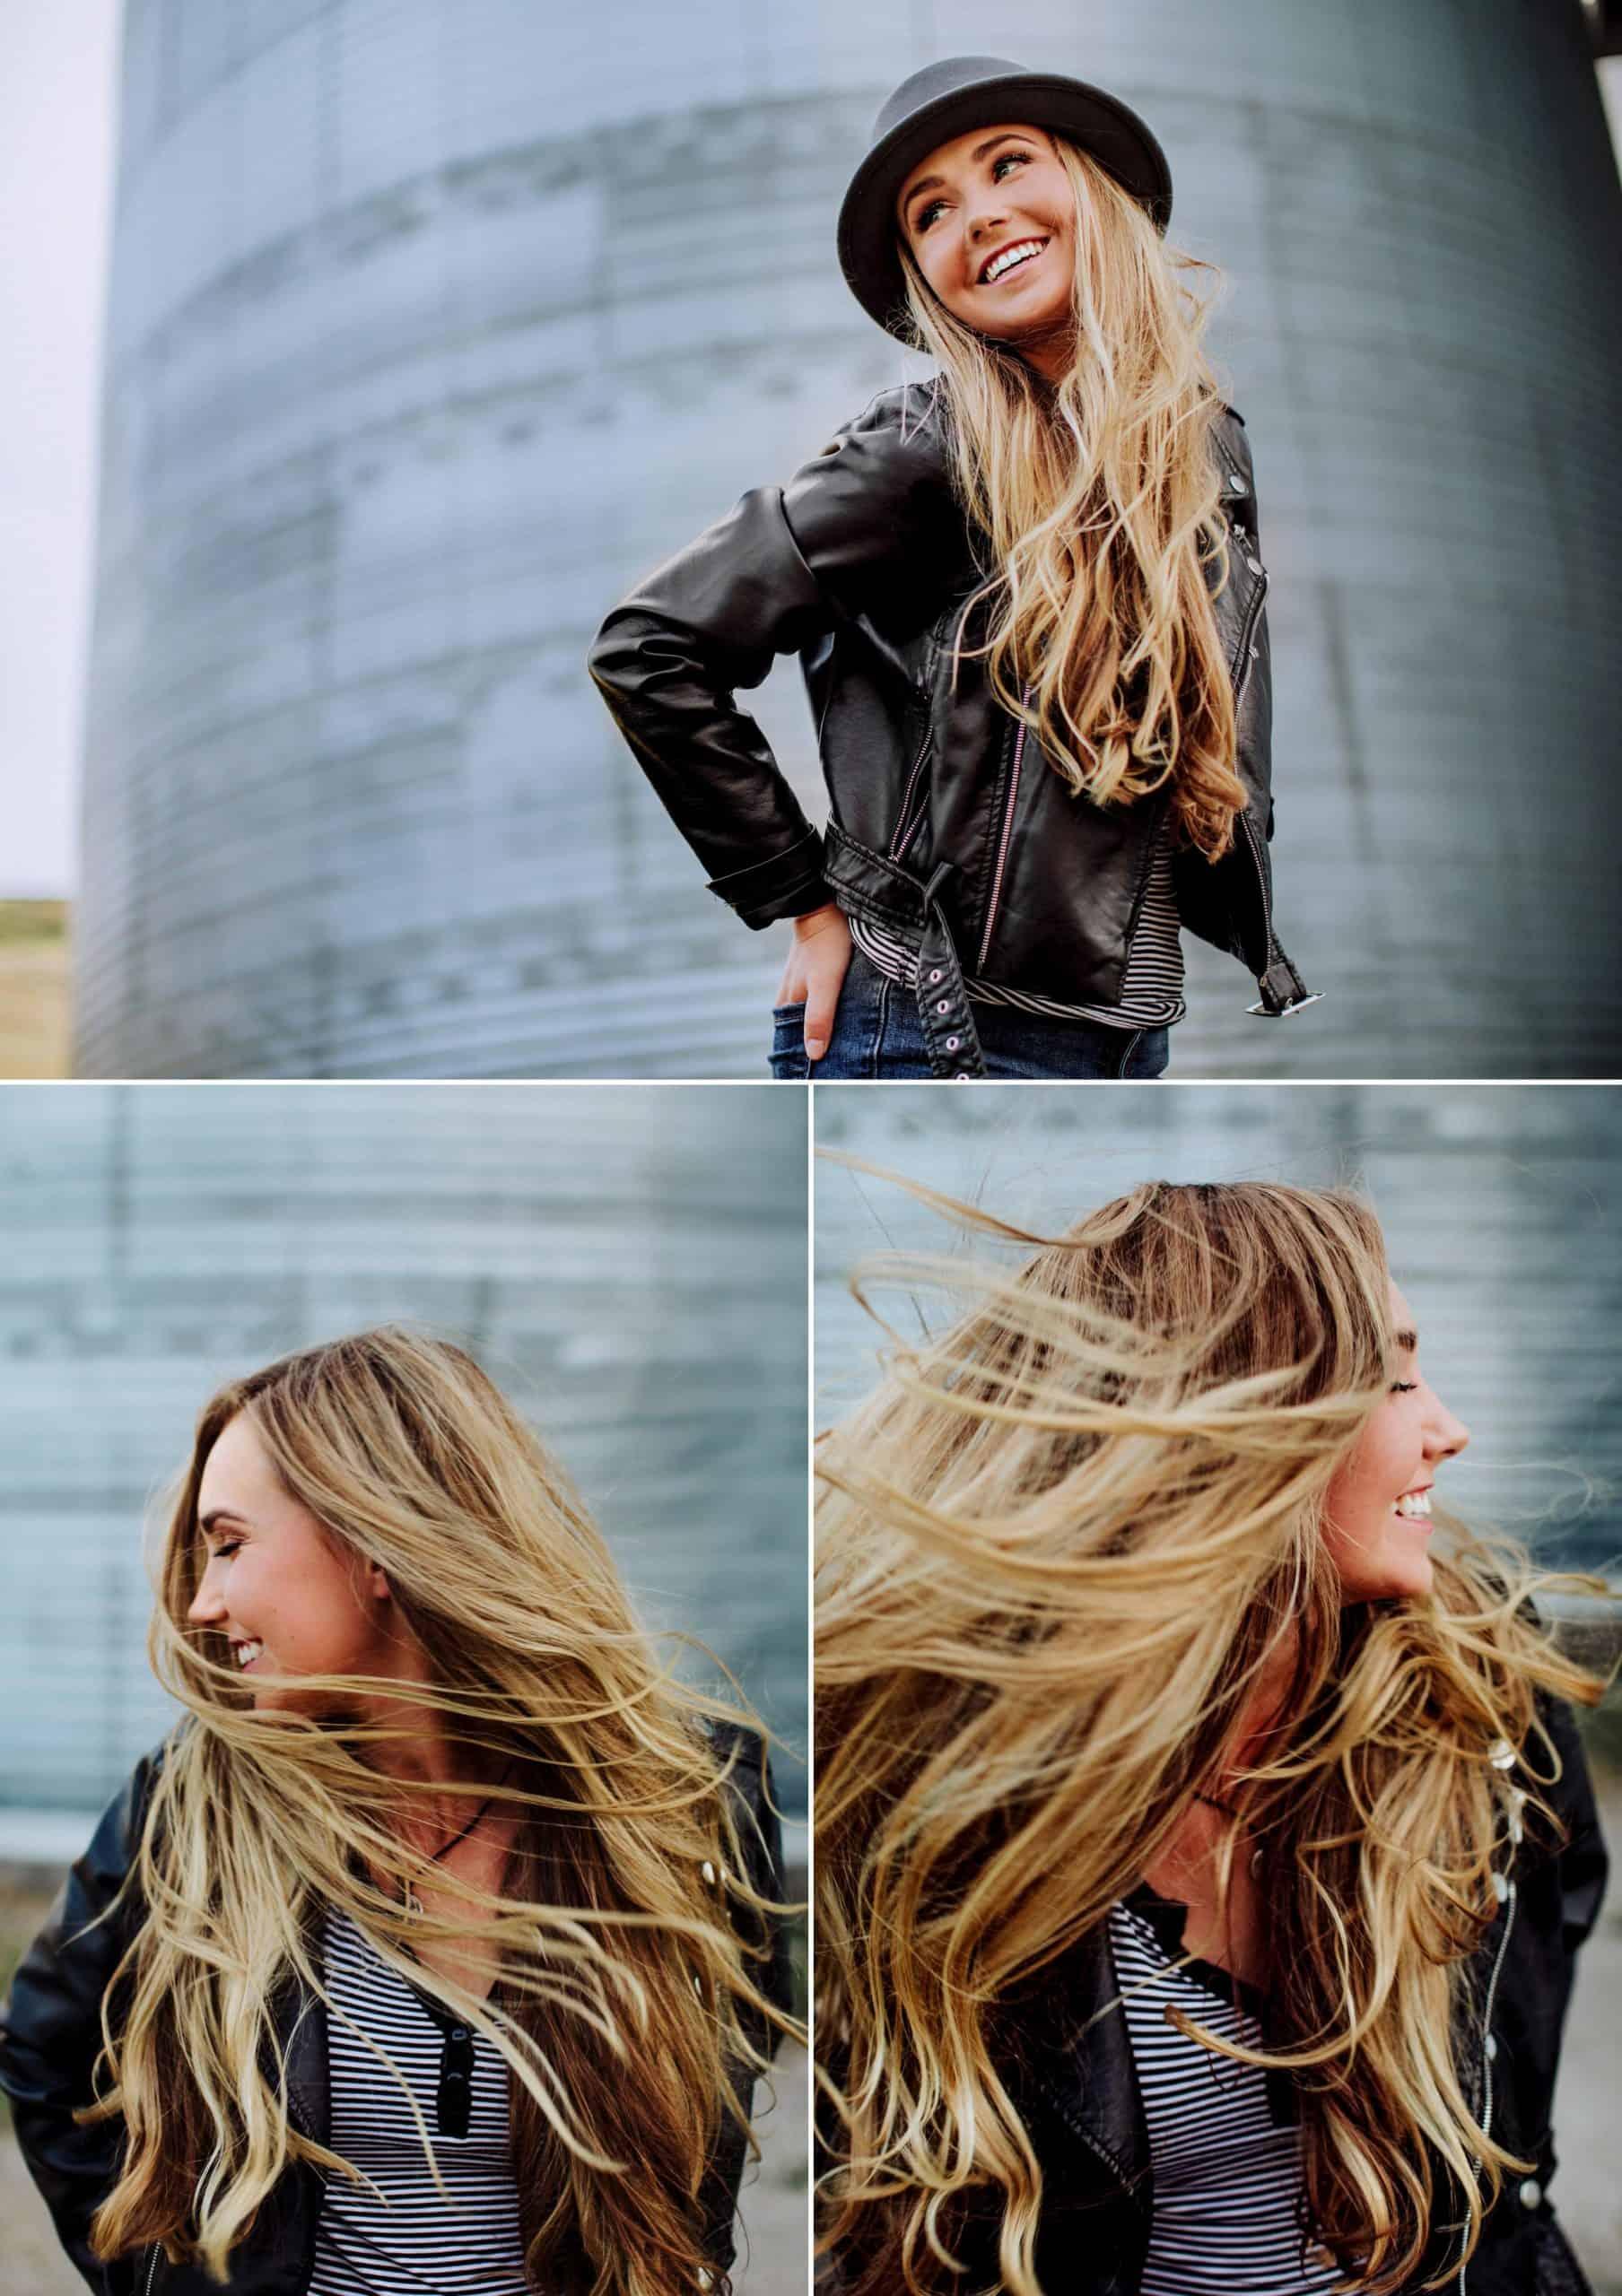 Kendyll, a senior from great falls Montana, flinging her hair